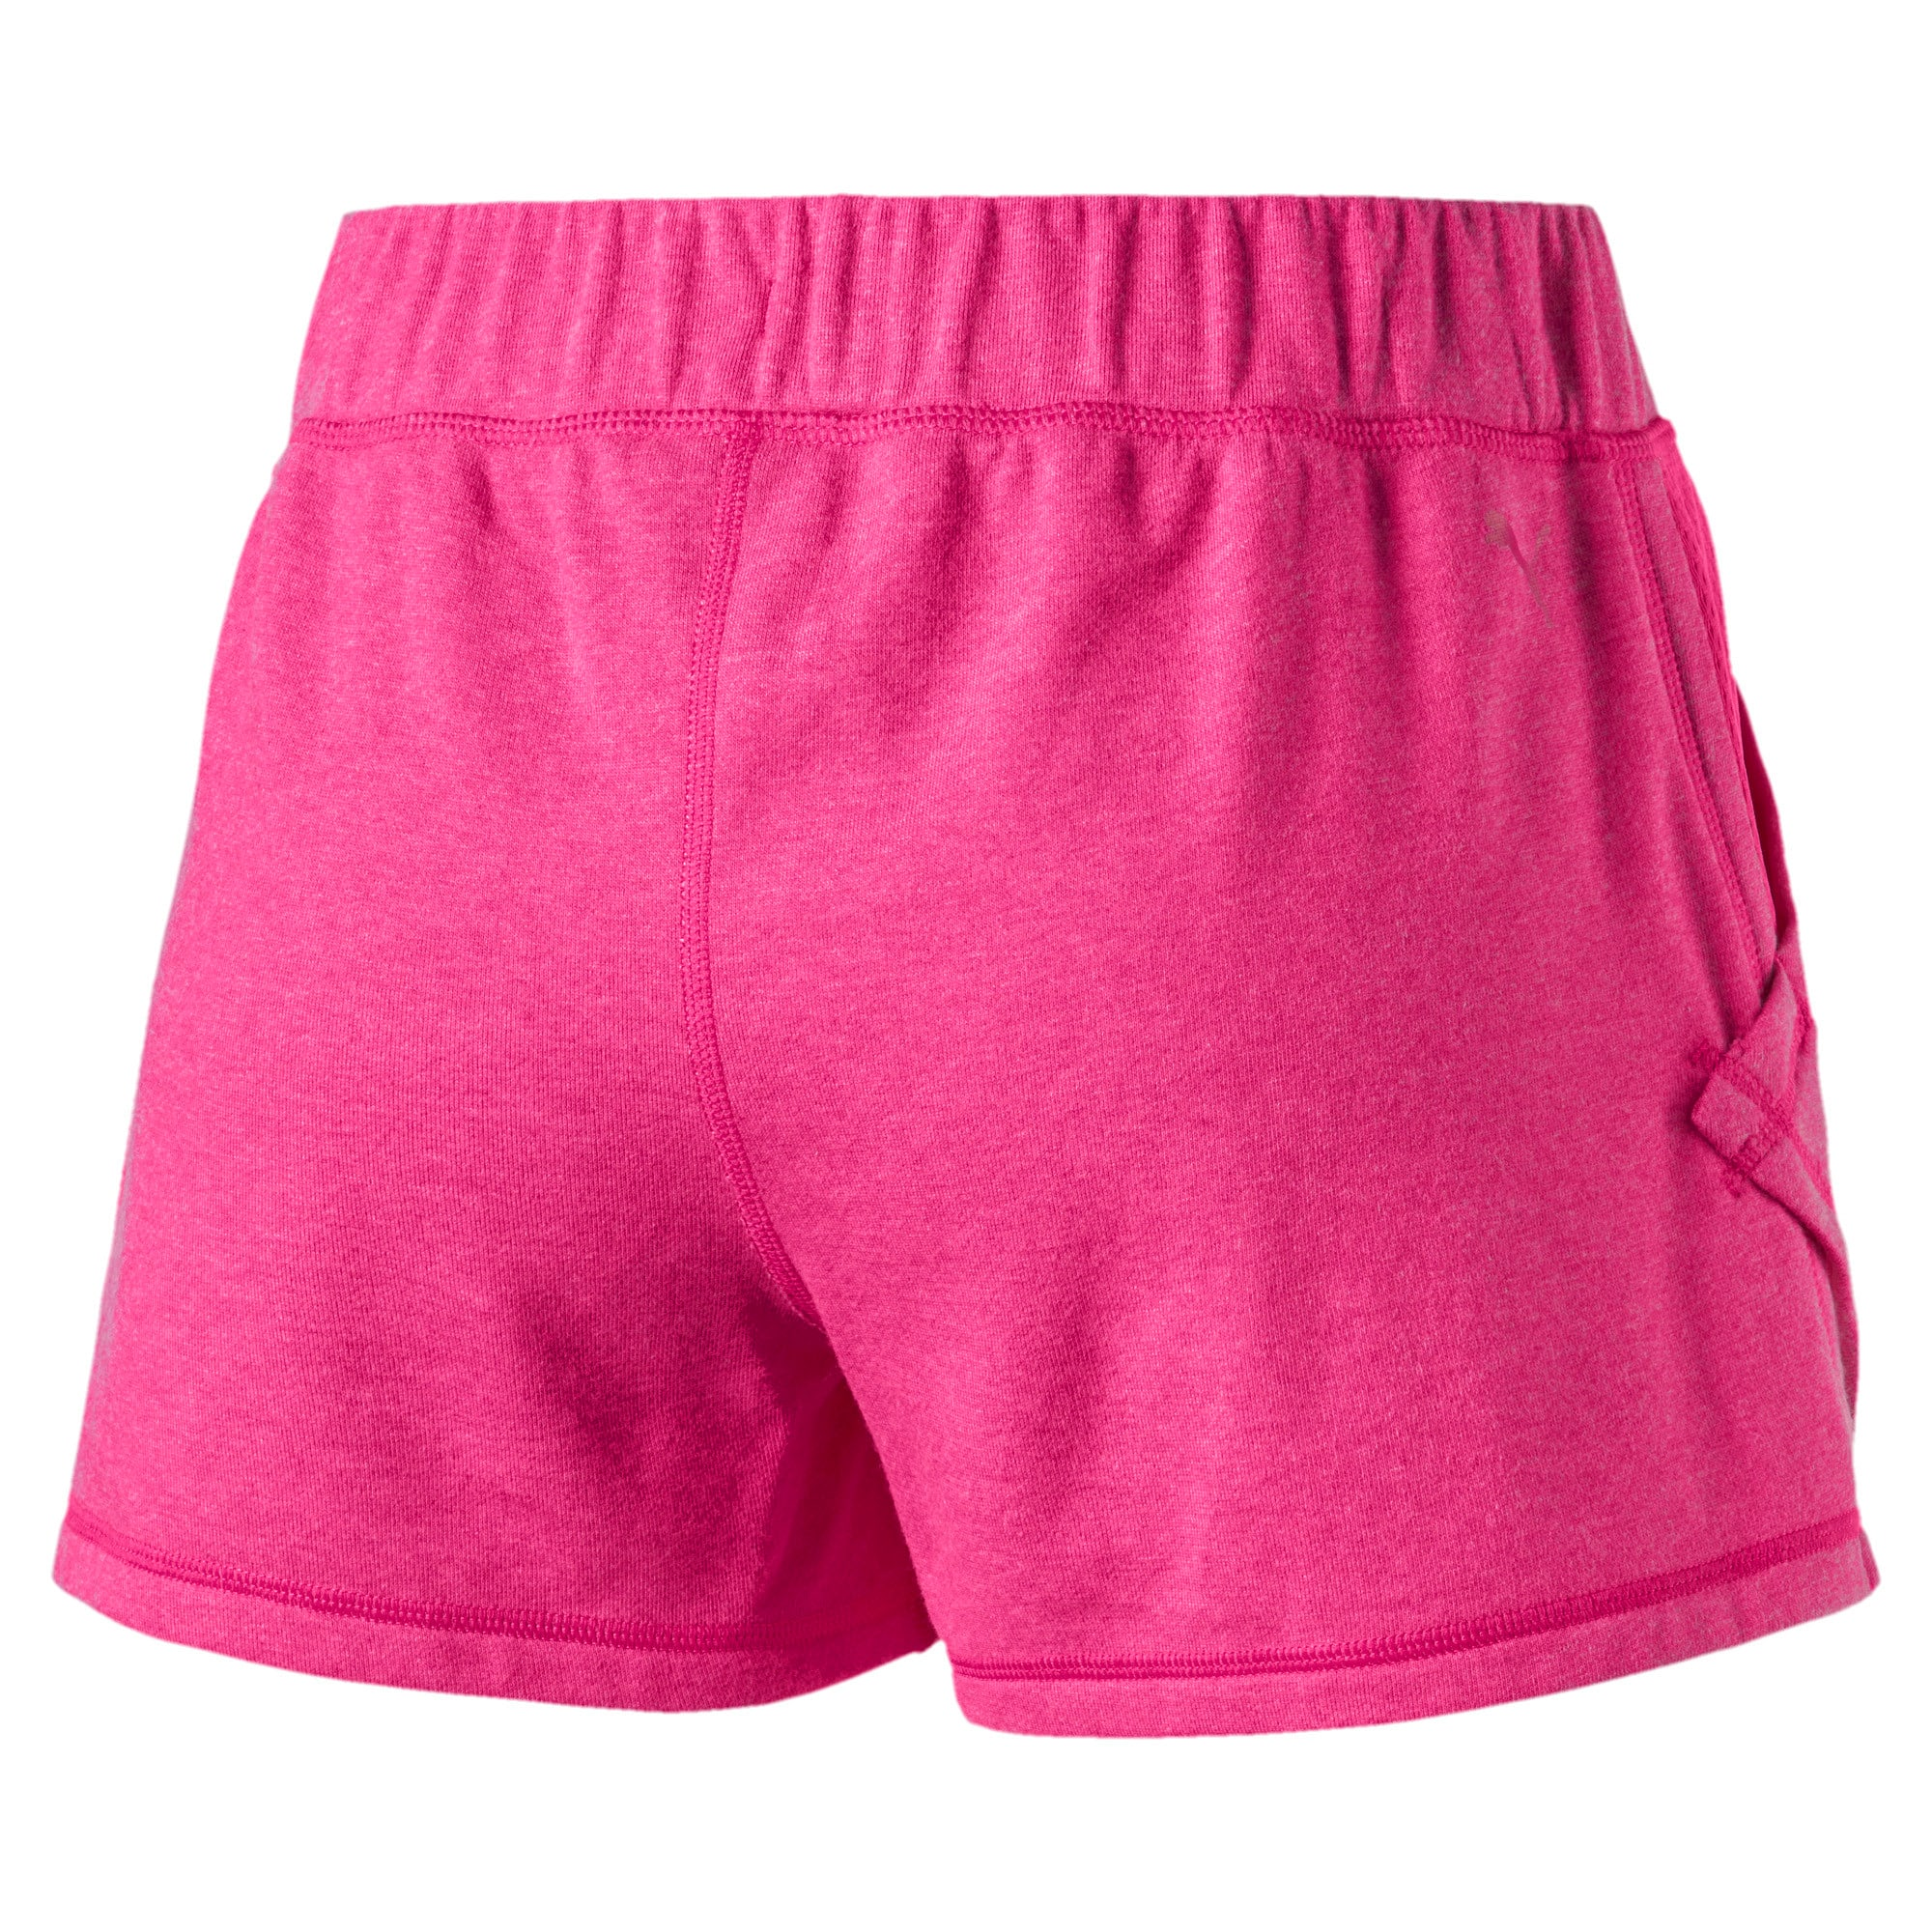 "Thumbnail 5 of A.C.E. Yogini 3"" Women's Training Shorts, Fuchsia Purple Heather, medium"